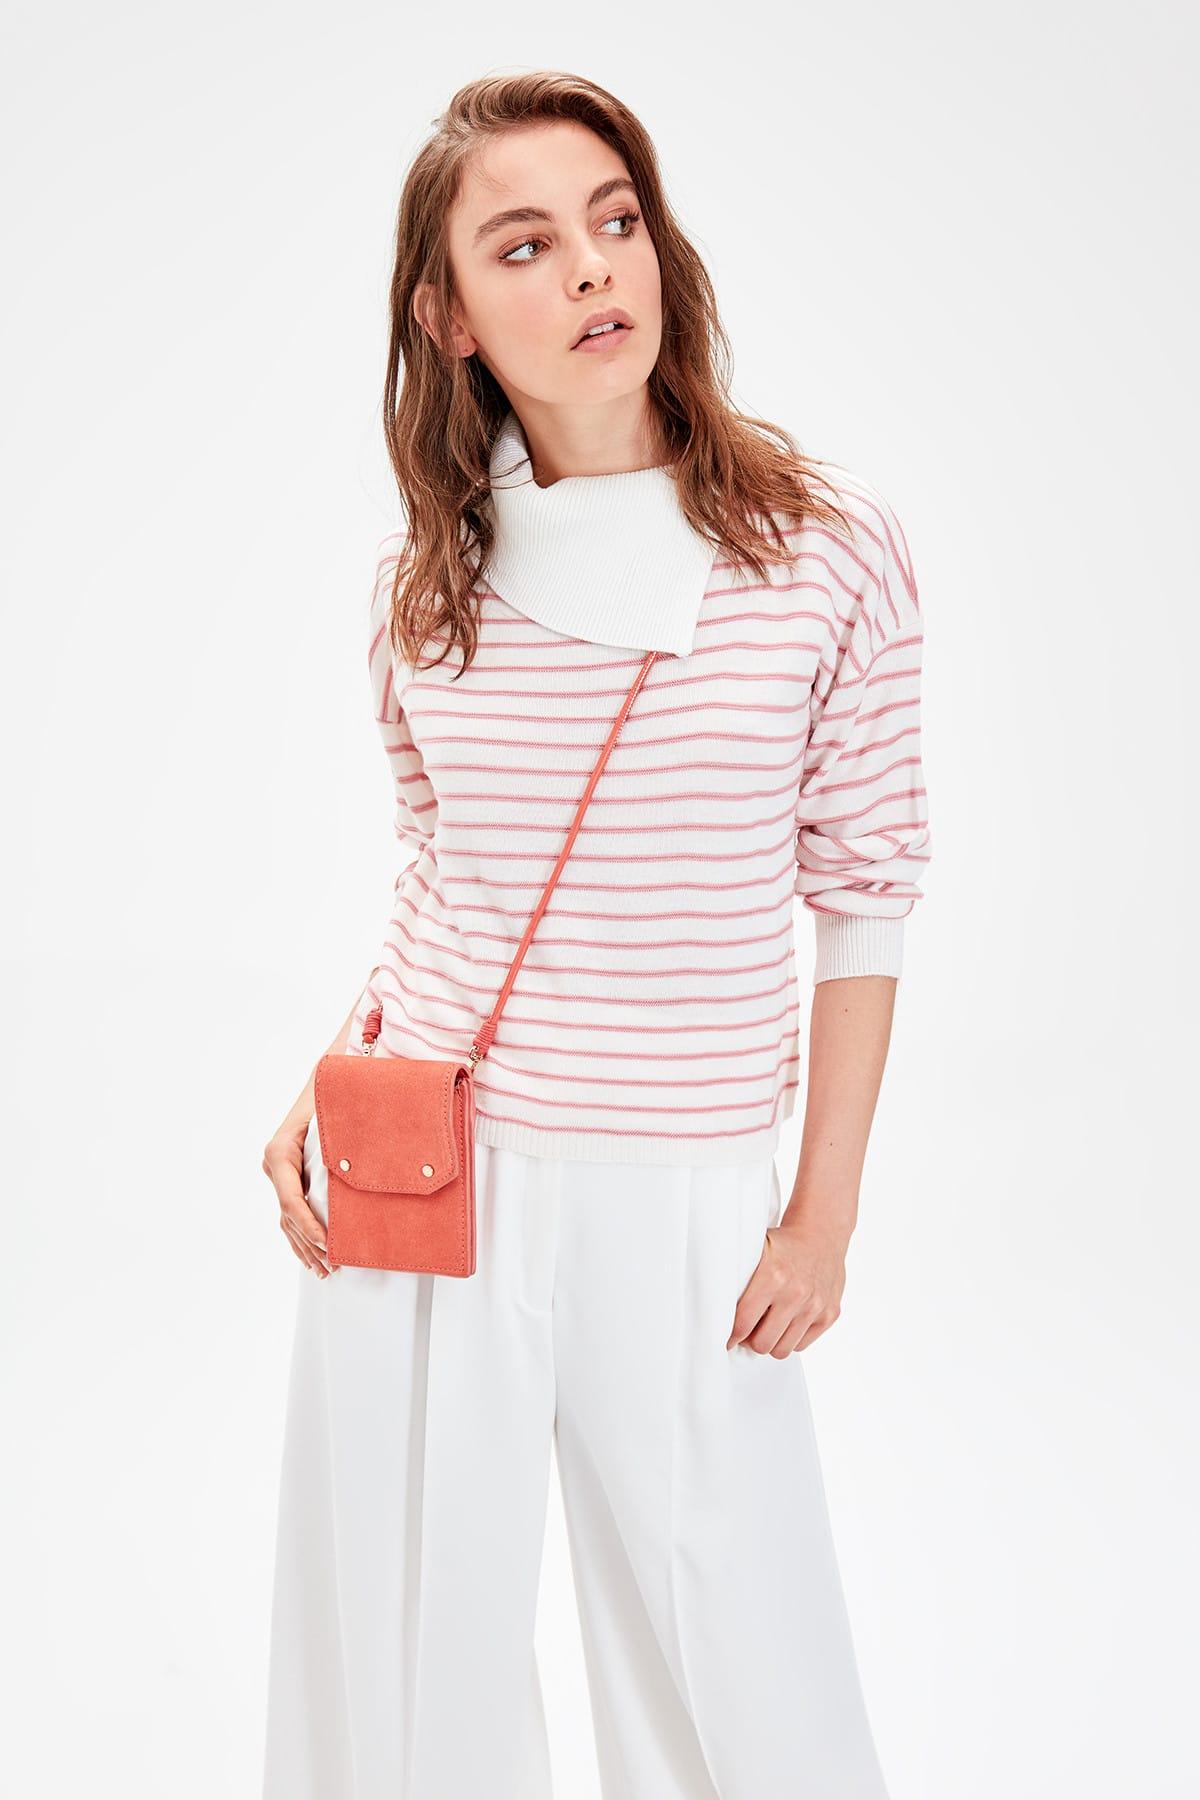 Trendyol WOMEN-Raw White Turtleneck Striped Sweater Sweater TWOAW20WW0009